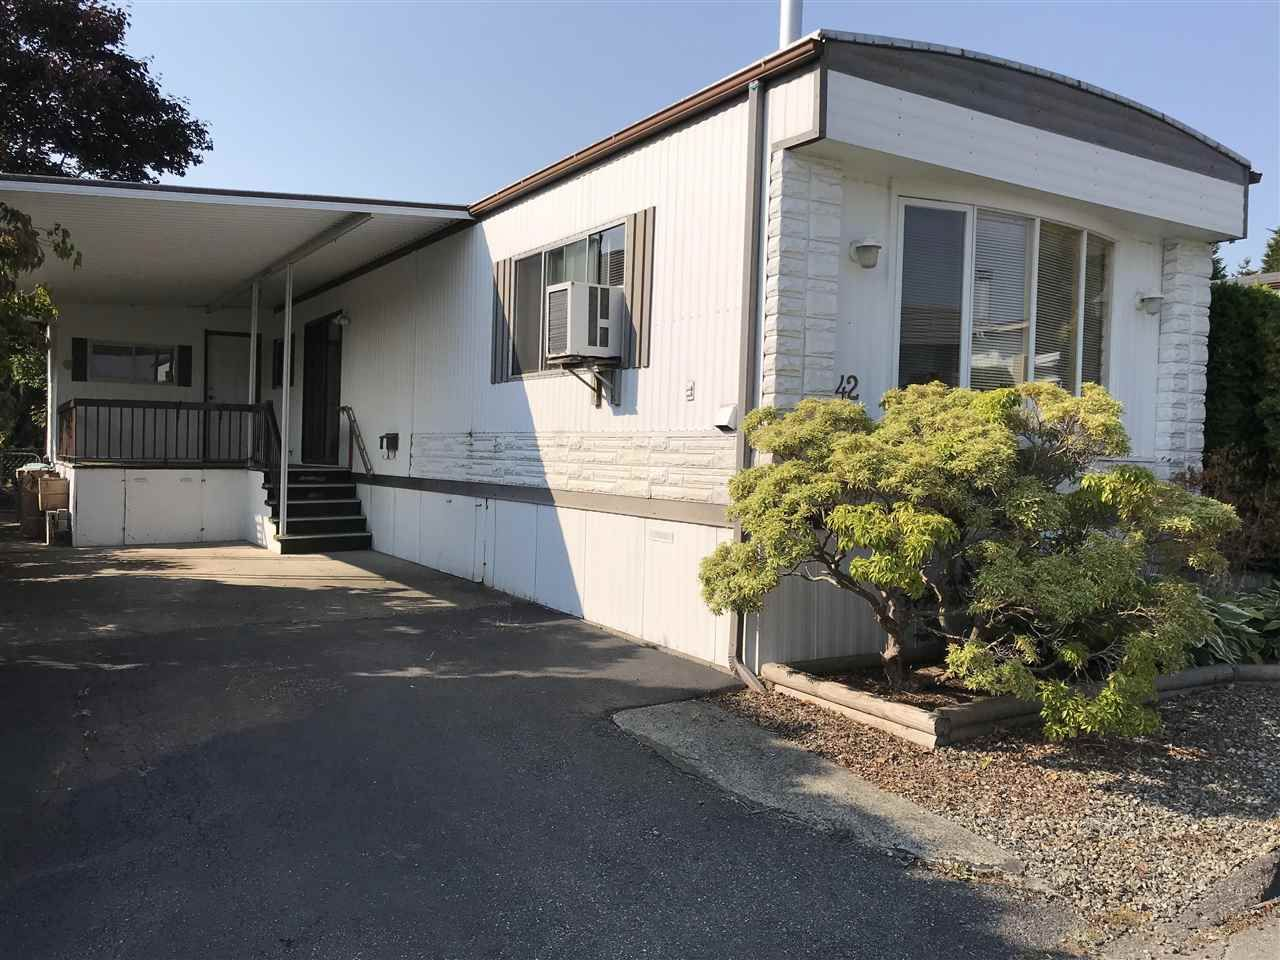 "Main Photo: 42 15875 20 Avenue in Surrey: King George Corridor Manufactured Home for sale in ""SEA RIDGE"" (South Surrey White Rock)  : MLS®# R2300530"